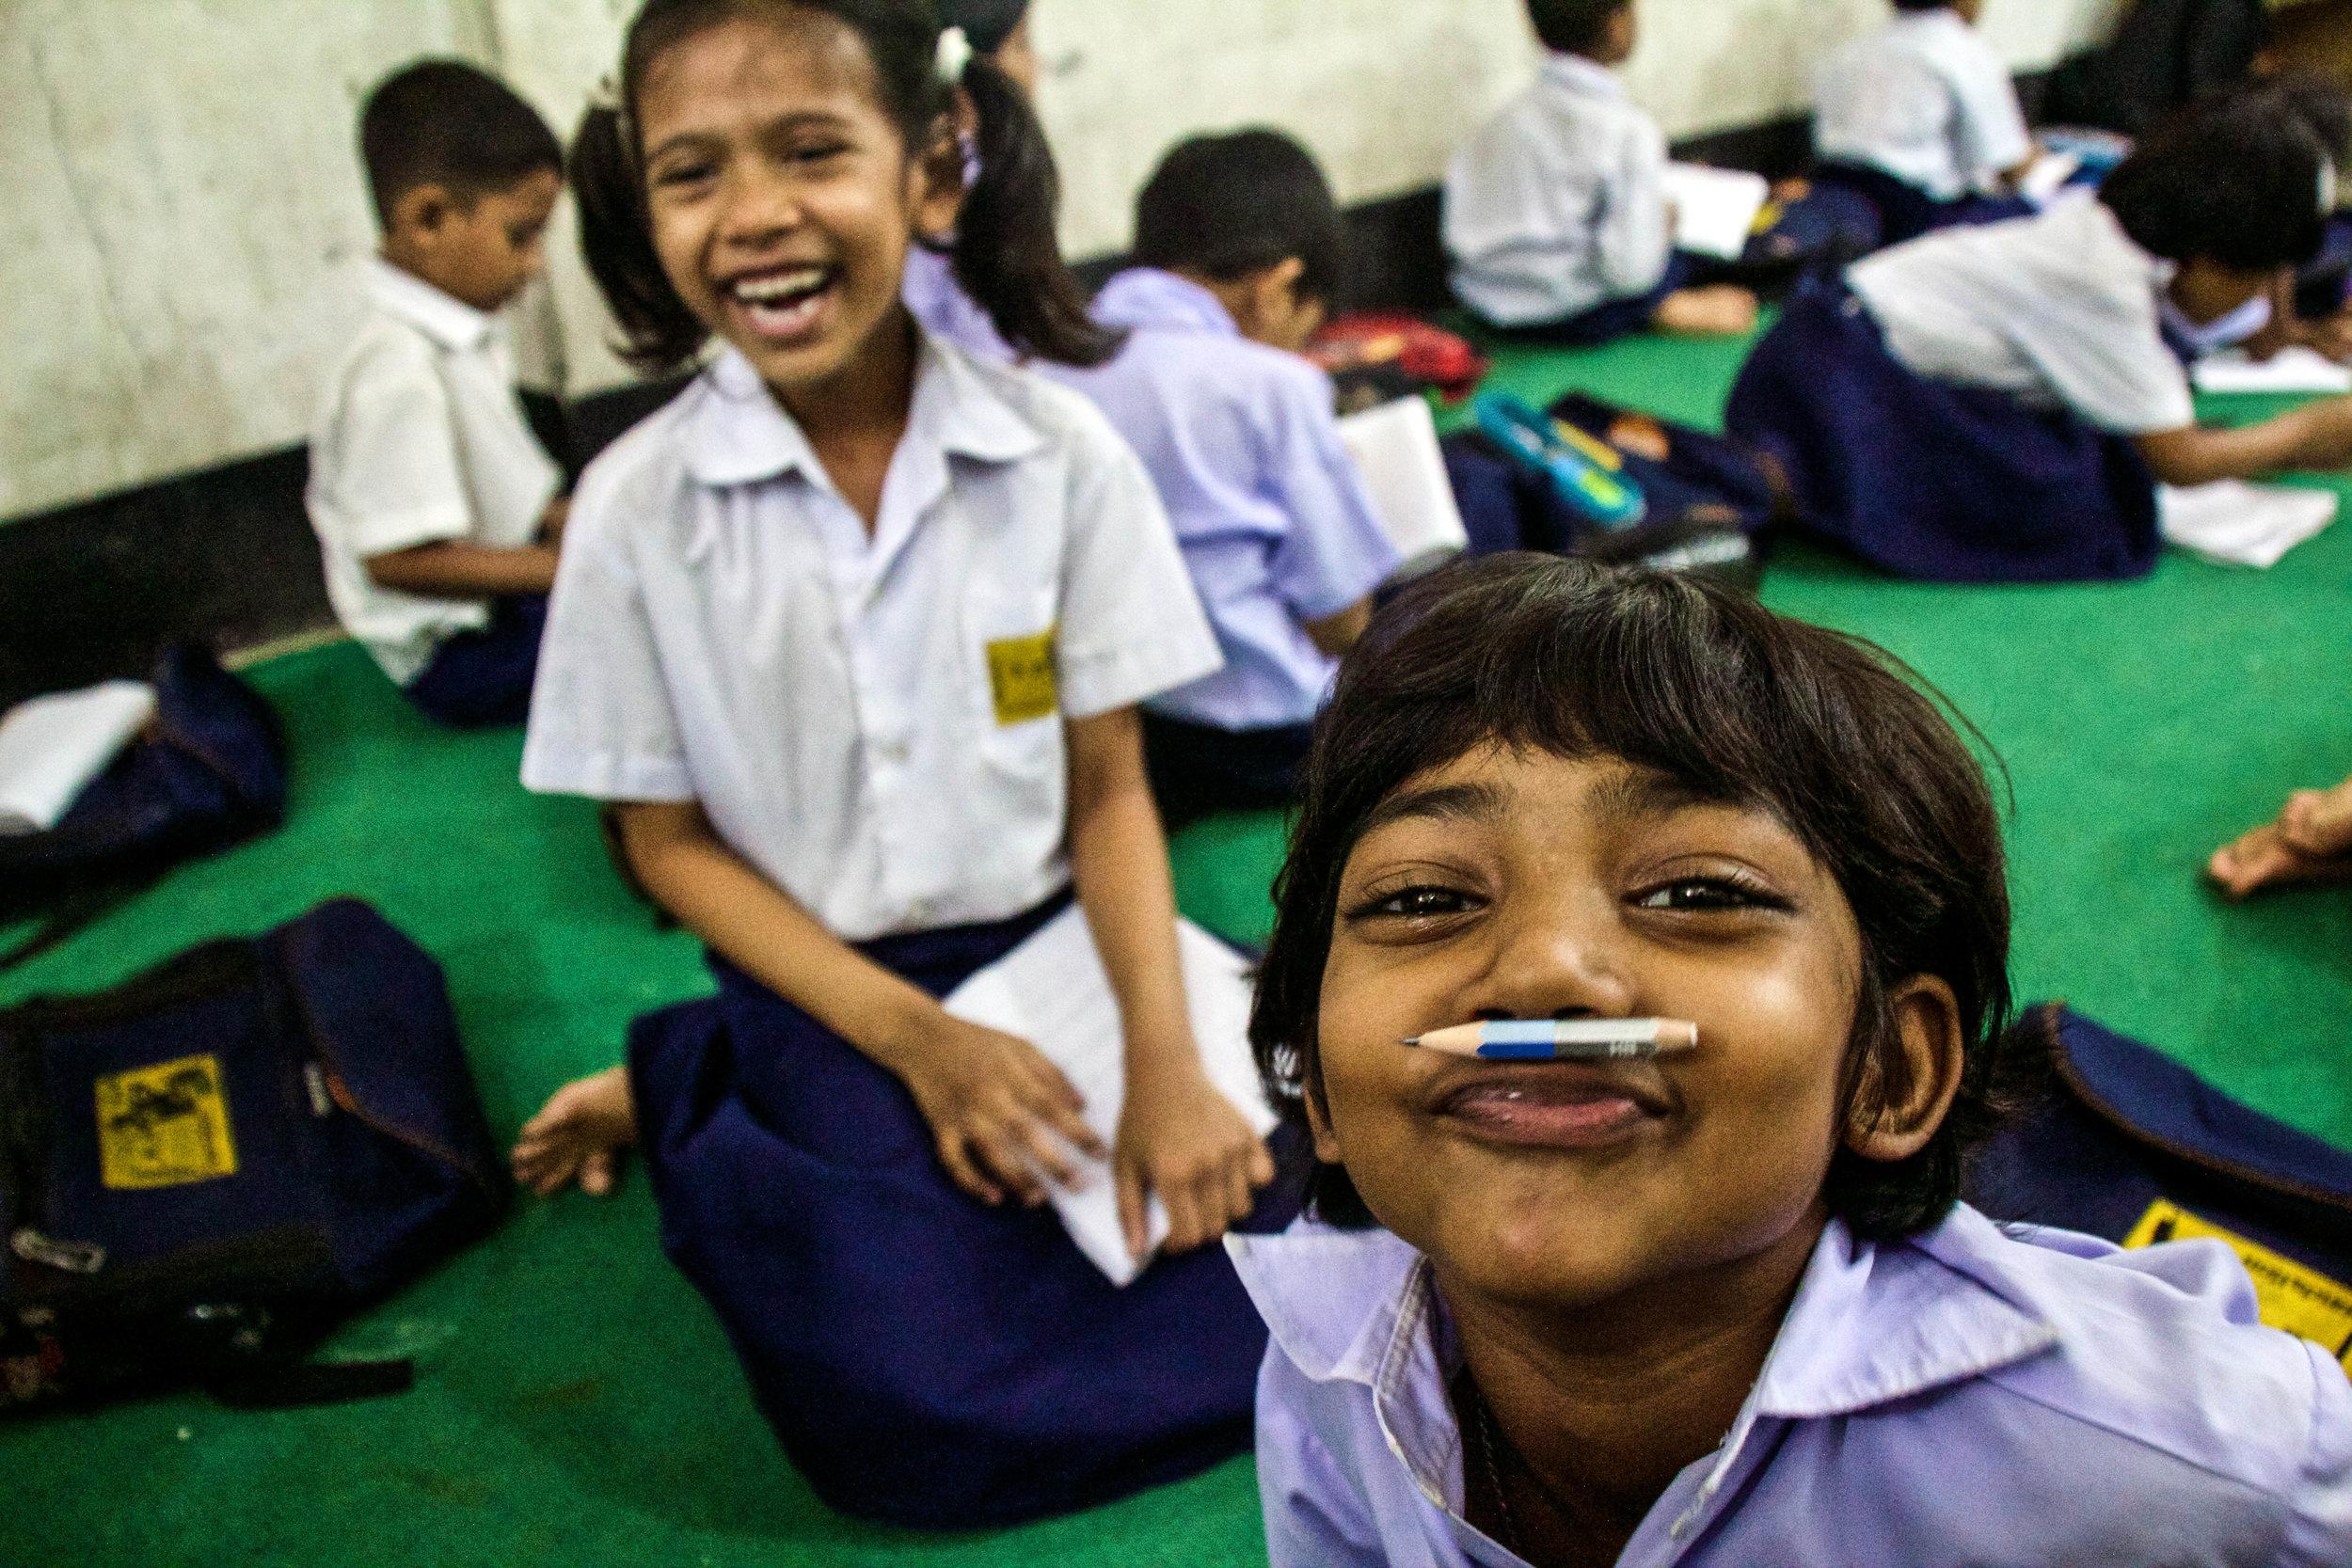 dhaka bangladesh jaago school children-63-43.jpg